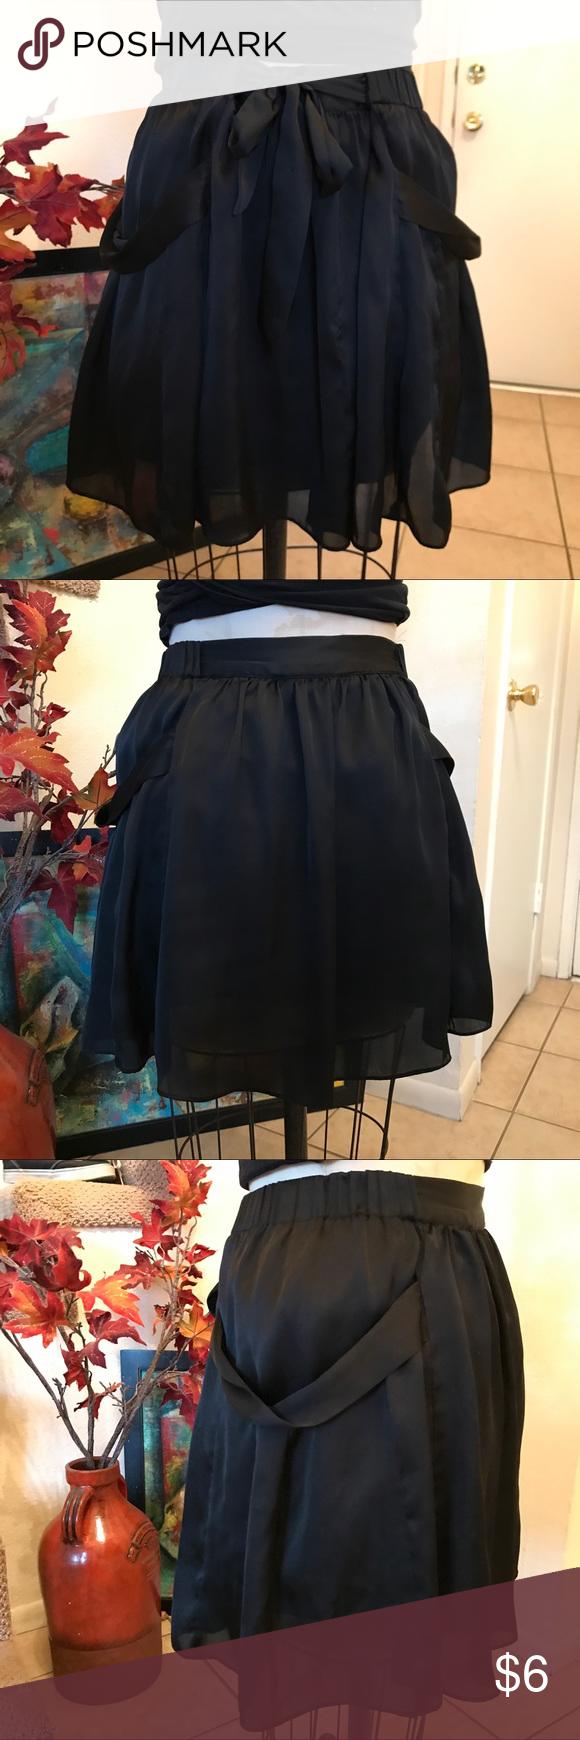 Forever 21 Skirt SZ Large Forever 21 Skirt SZ Large Rory Beca Skirts Circle & Skater